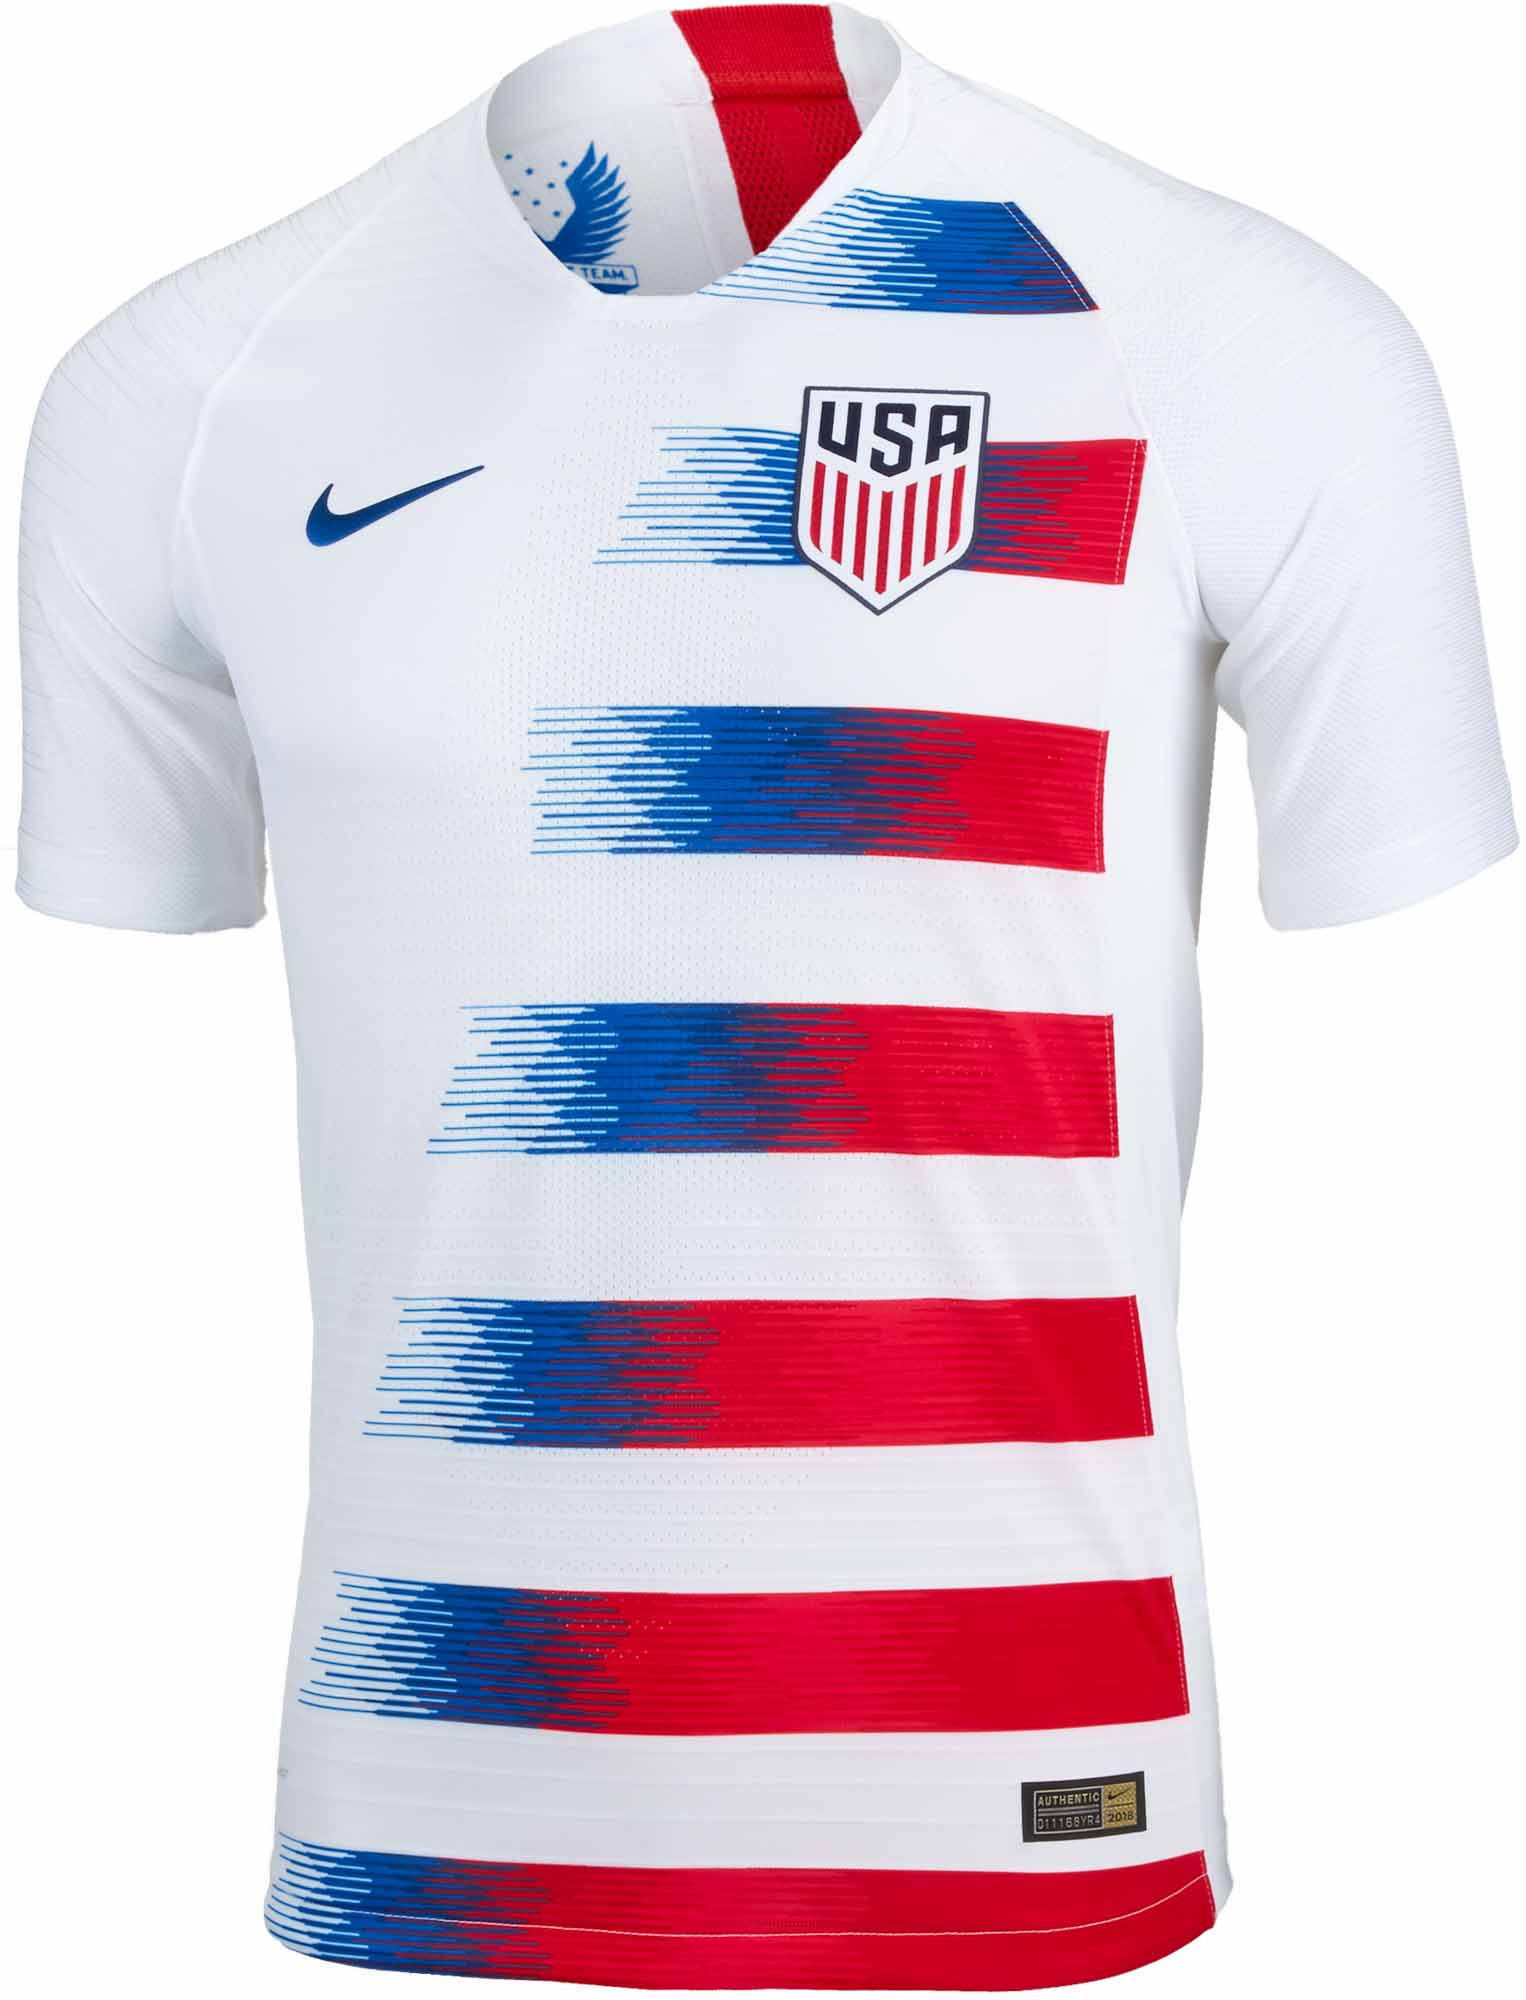 Nike USA Home Match Jersey 2018-19 - SoccerPro.com